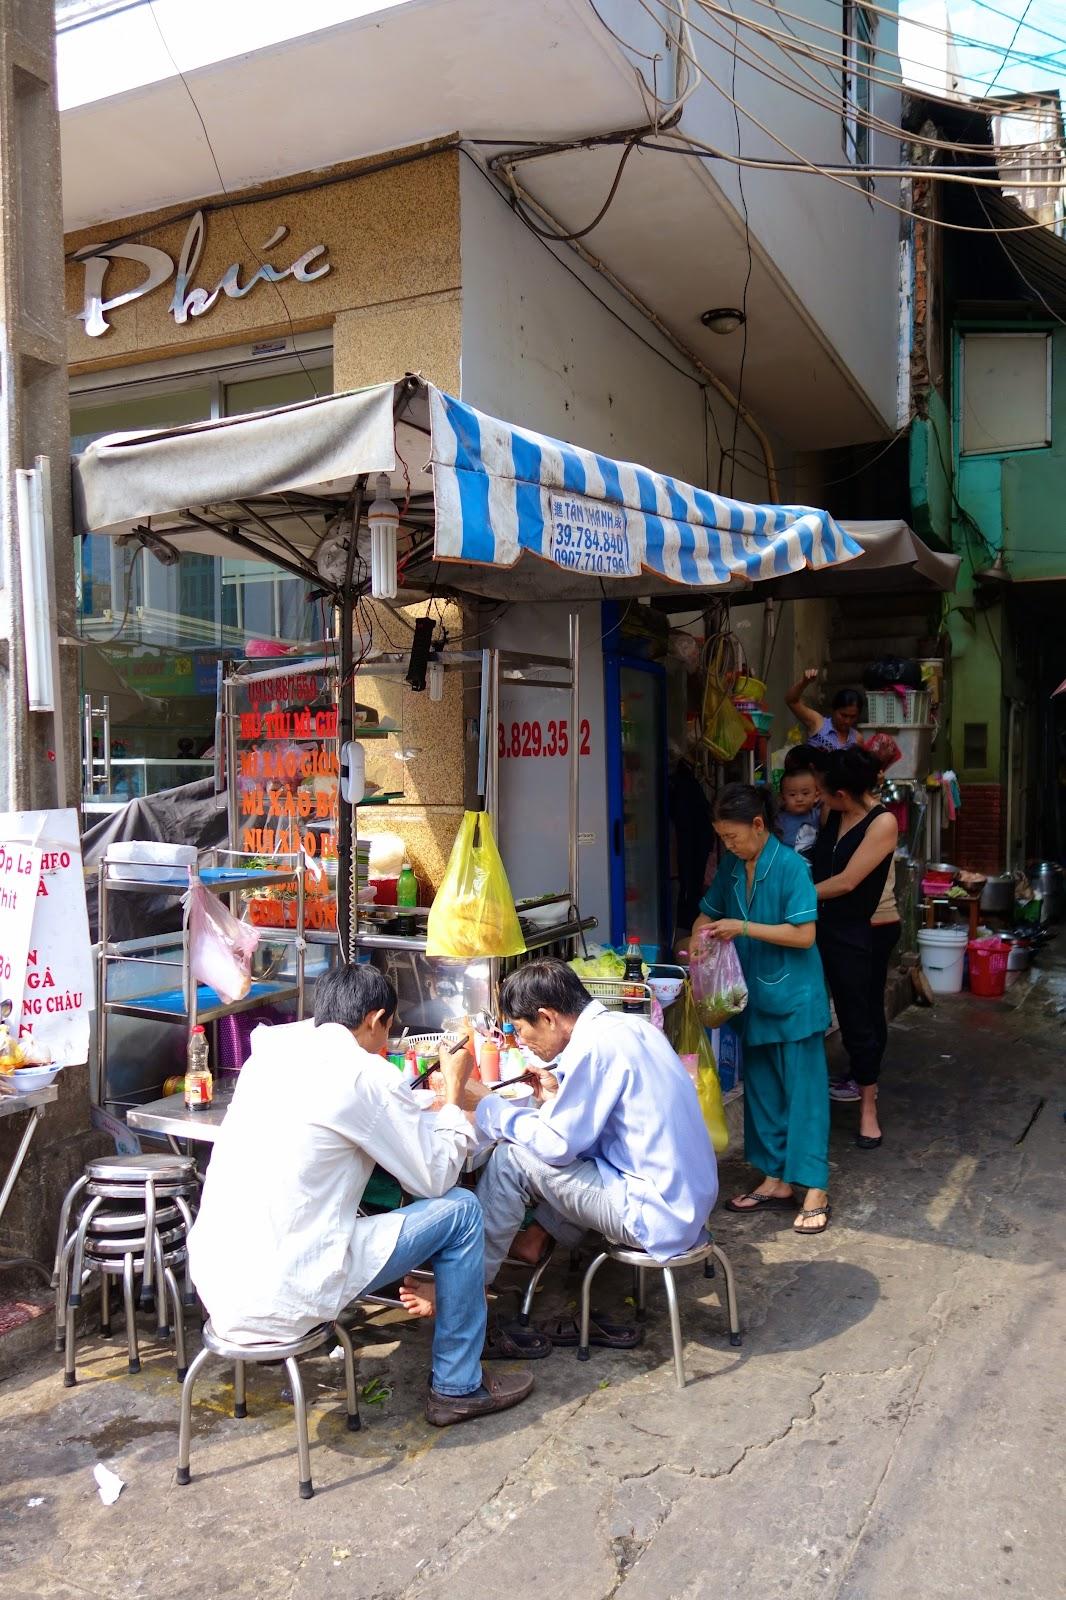 streets of Vietnam 2015